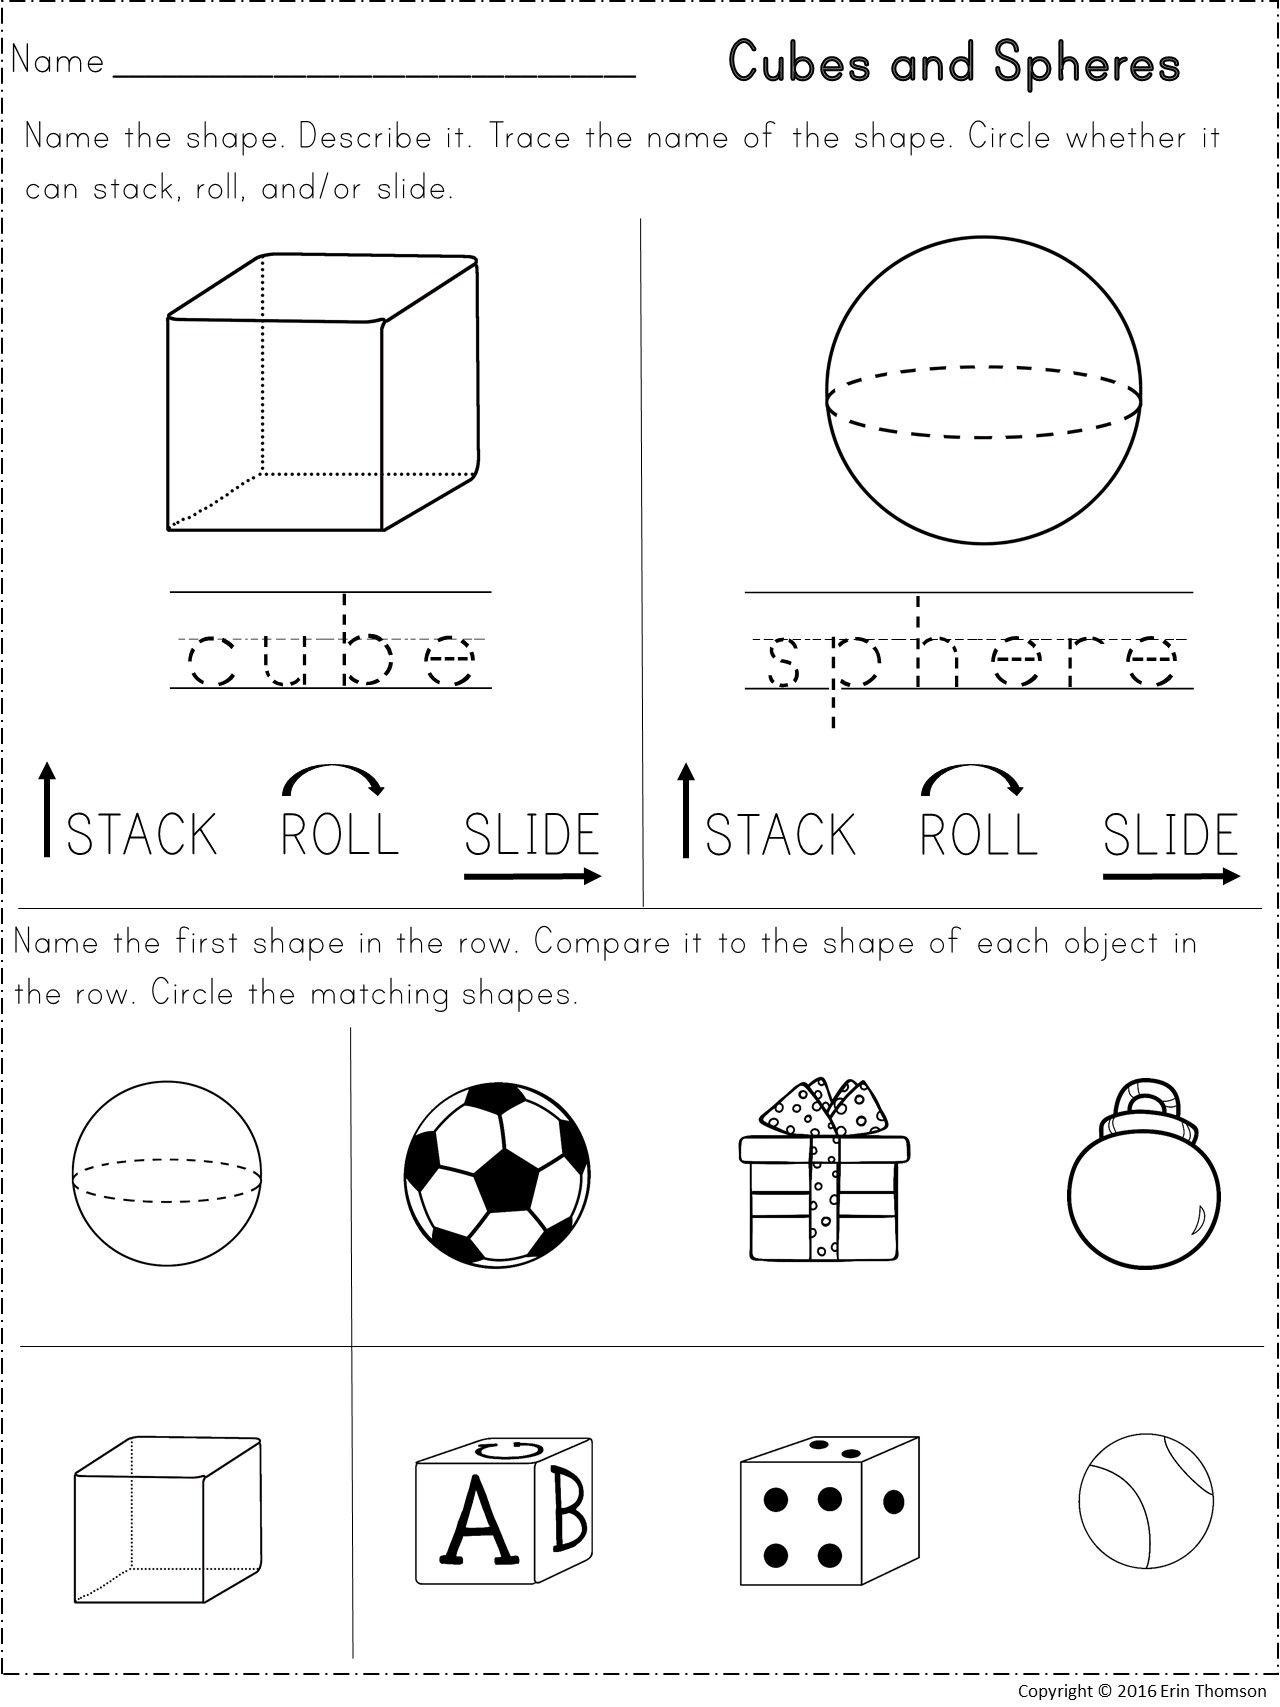 Kindergarten Math Unit Shapes And Patterns Shapes Worksheet Kindergarten Shapes Worksheets Shapes Worksheet Circle shape preschool worksheets